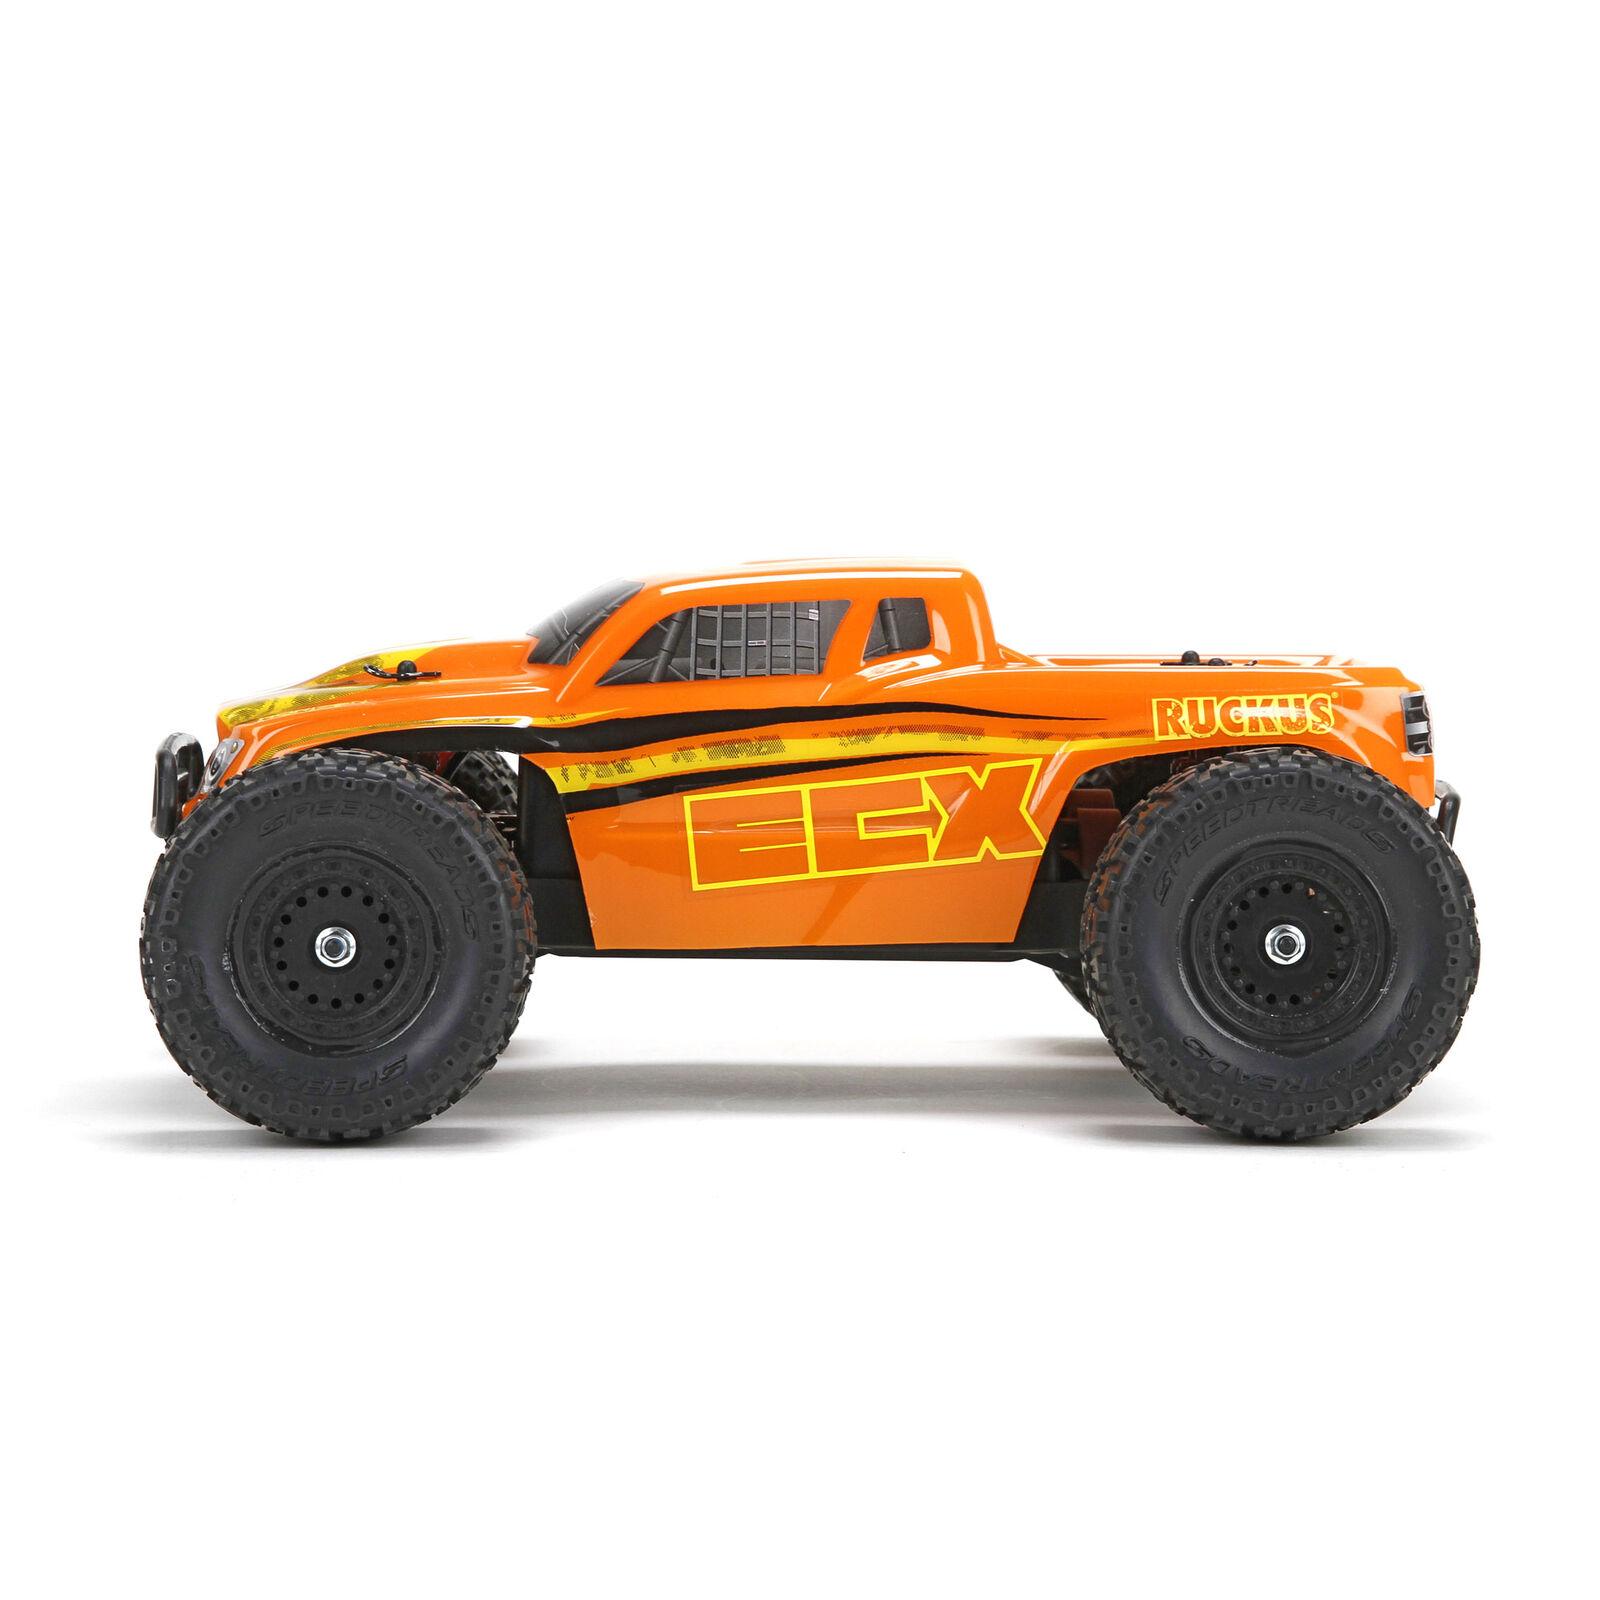 1/18 Ruckus 4WD Monster Truck RTR, Orange/Yellow